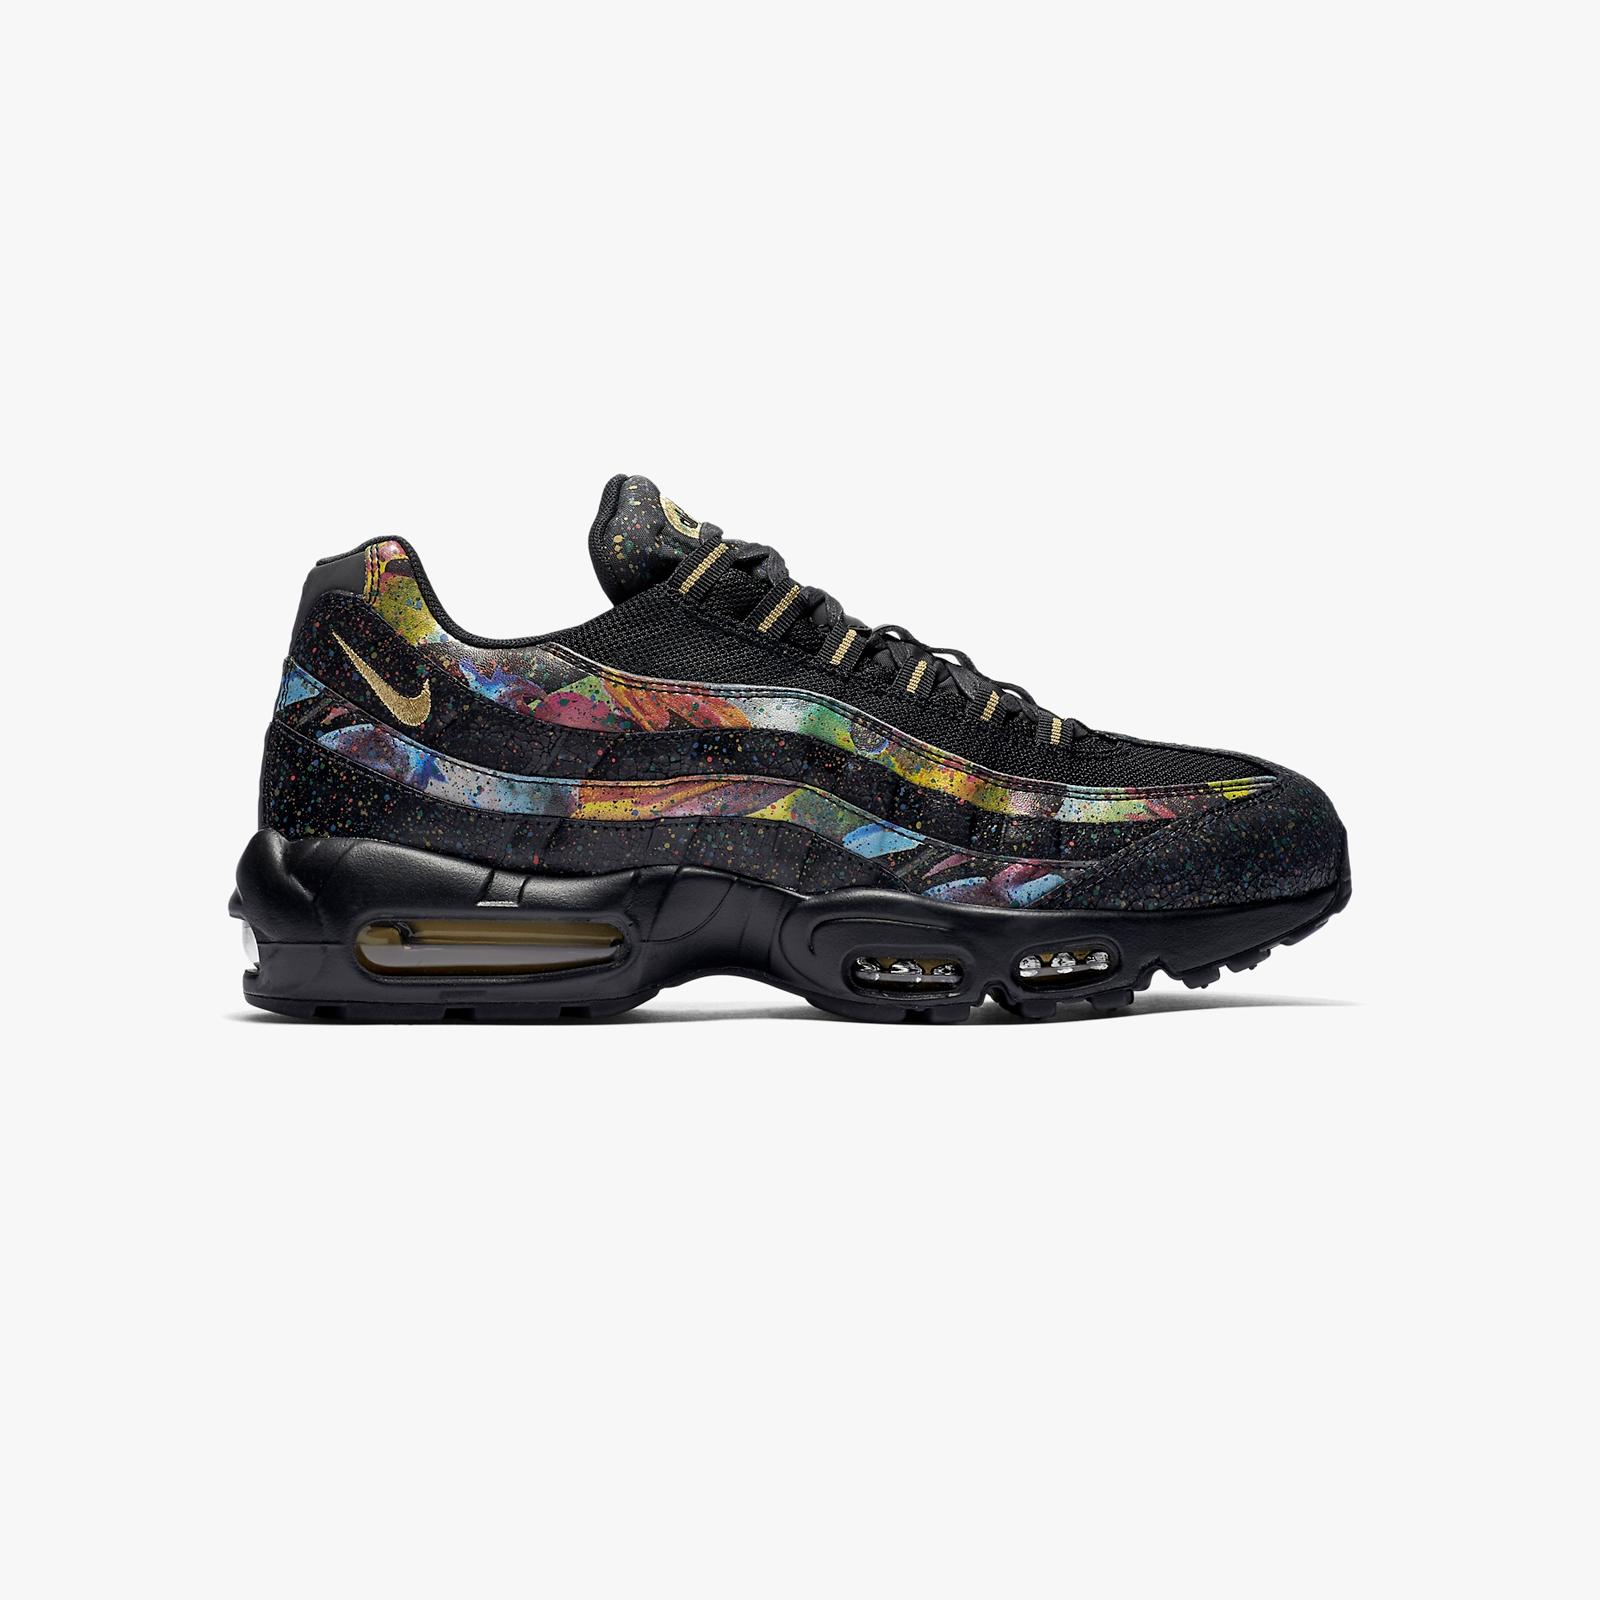 eb5c5f4415db7c Nike Air Max 95 - At6142-001 - Sneakersnstuff